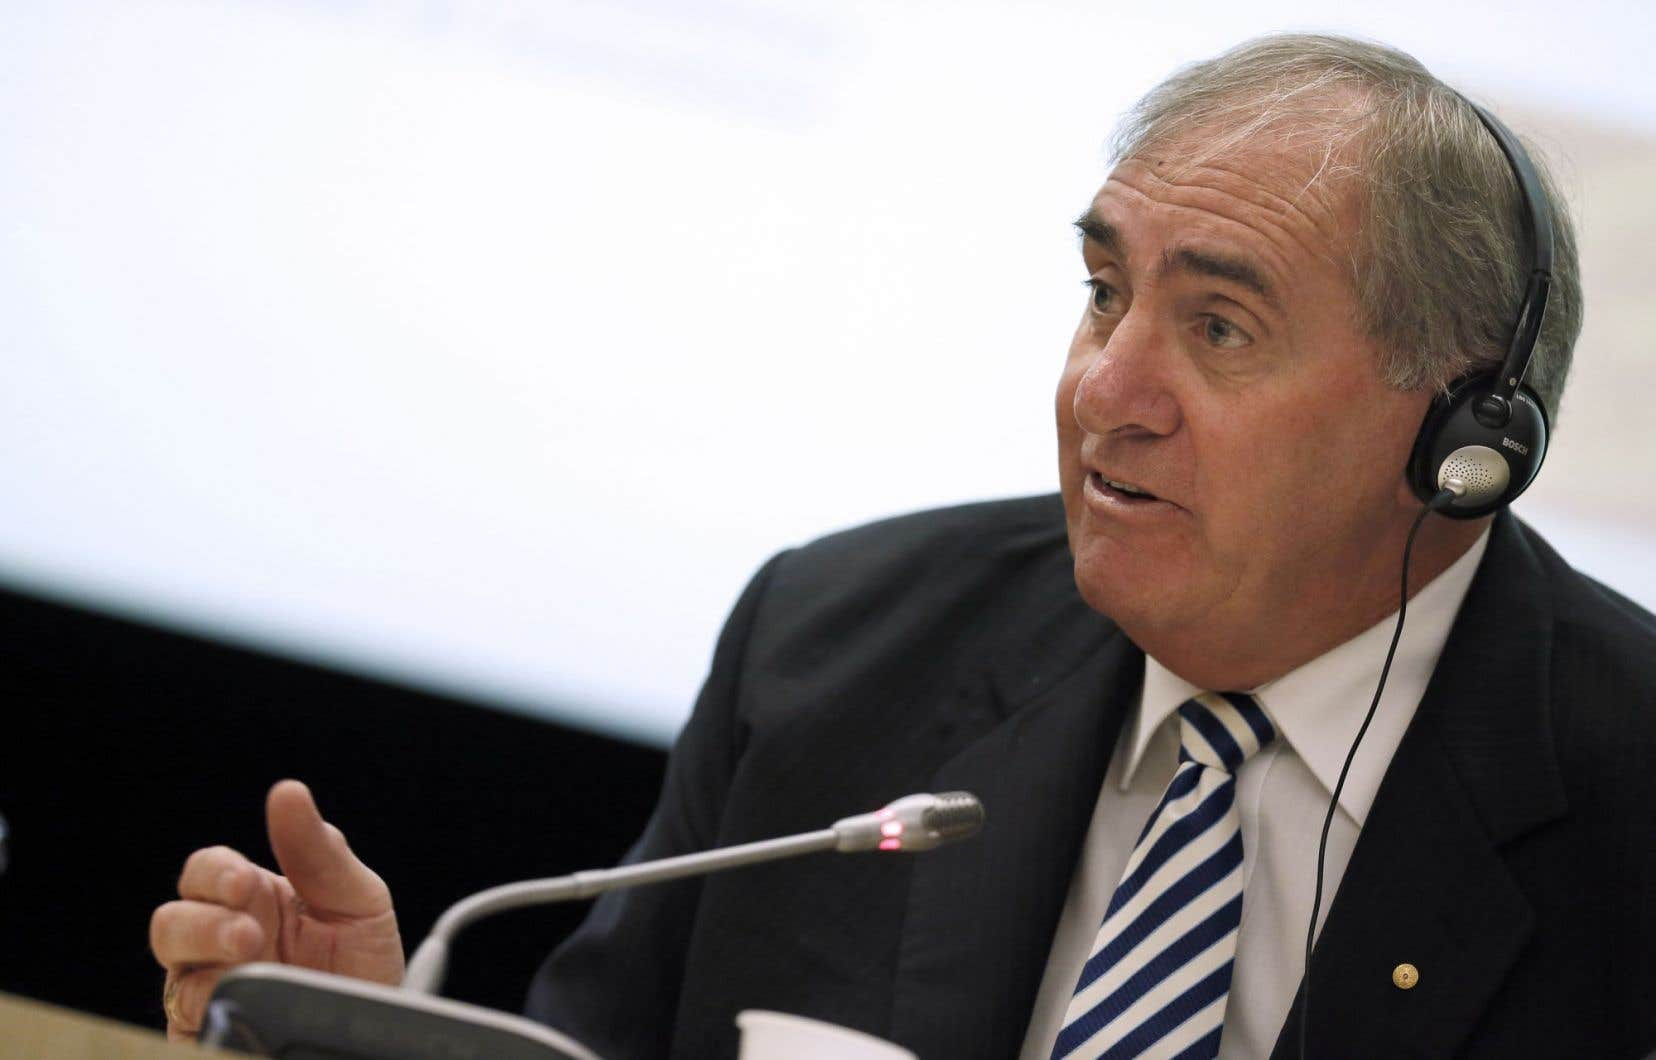 L'ancien président de l'Agence mondiale antidopage John Fahey